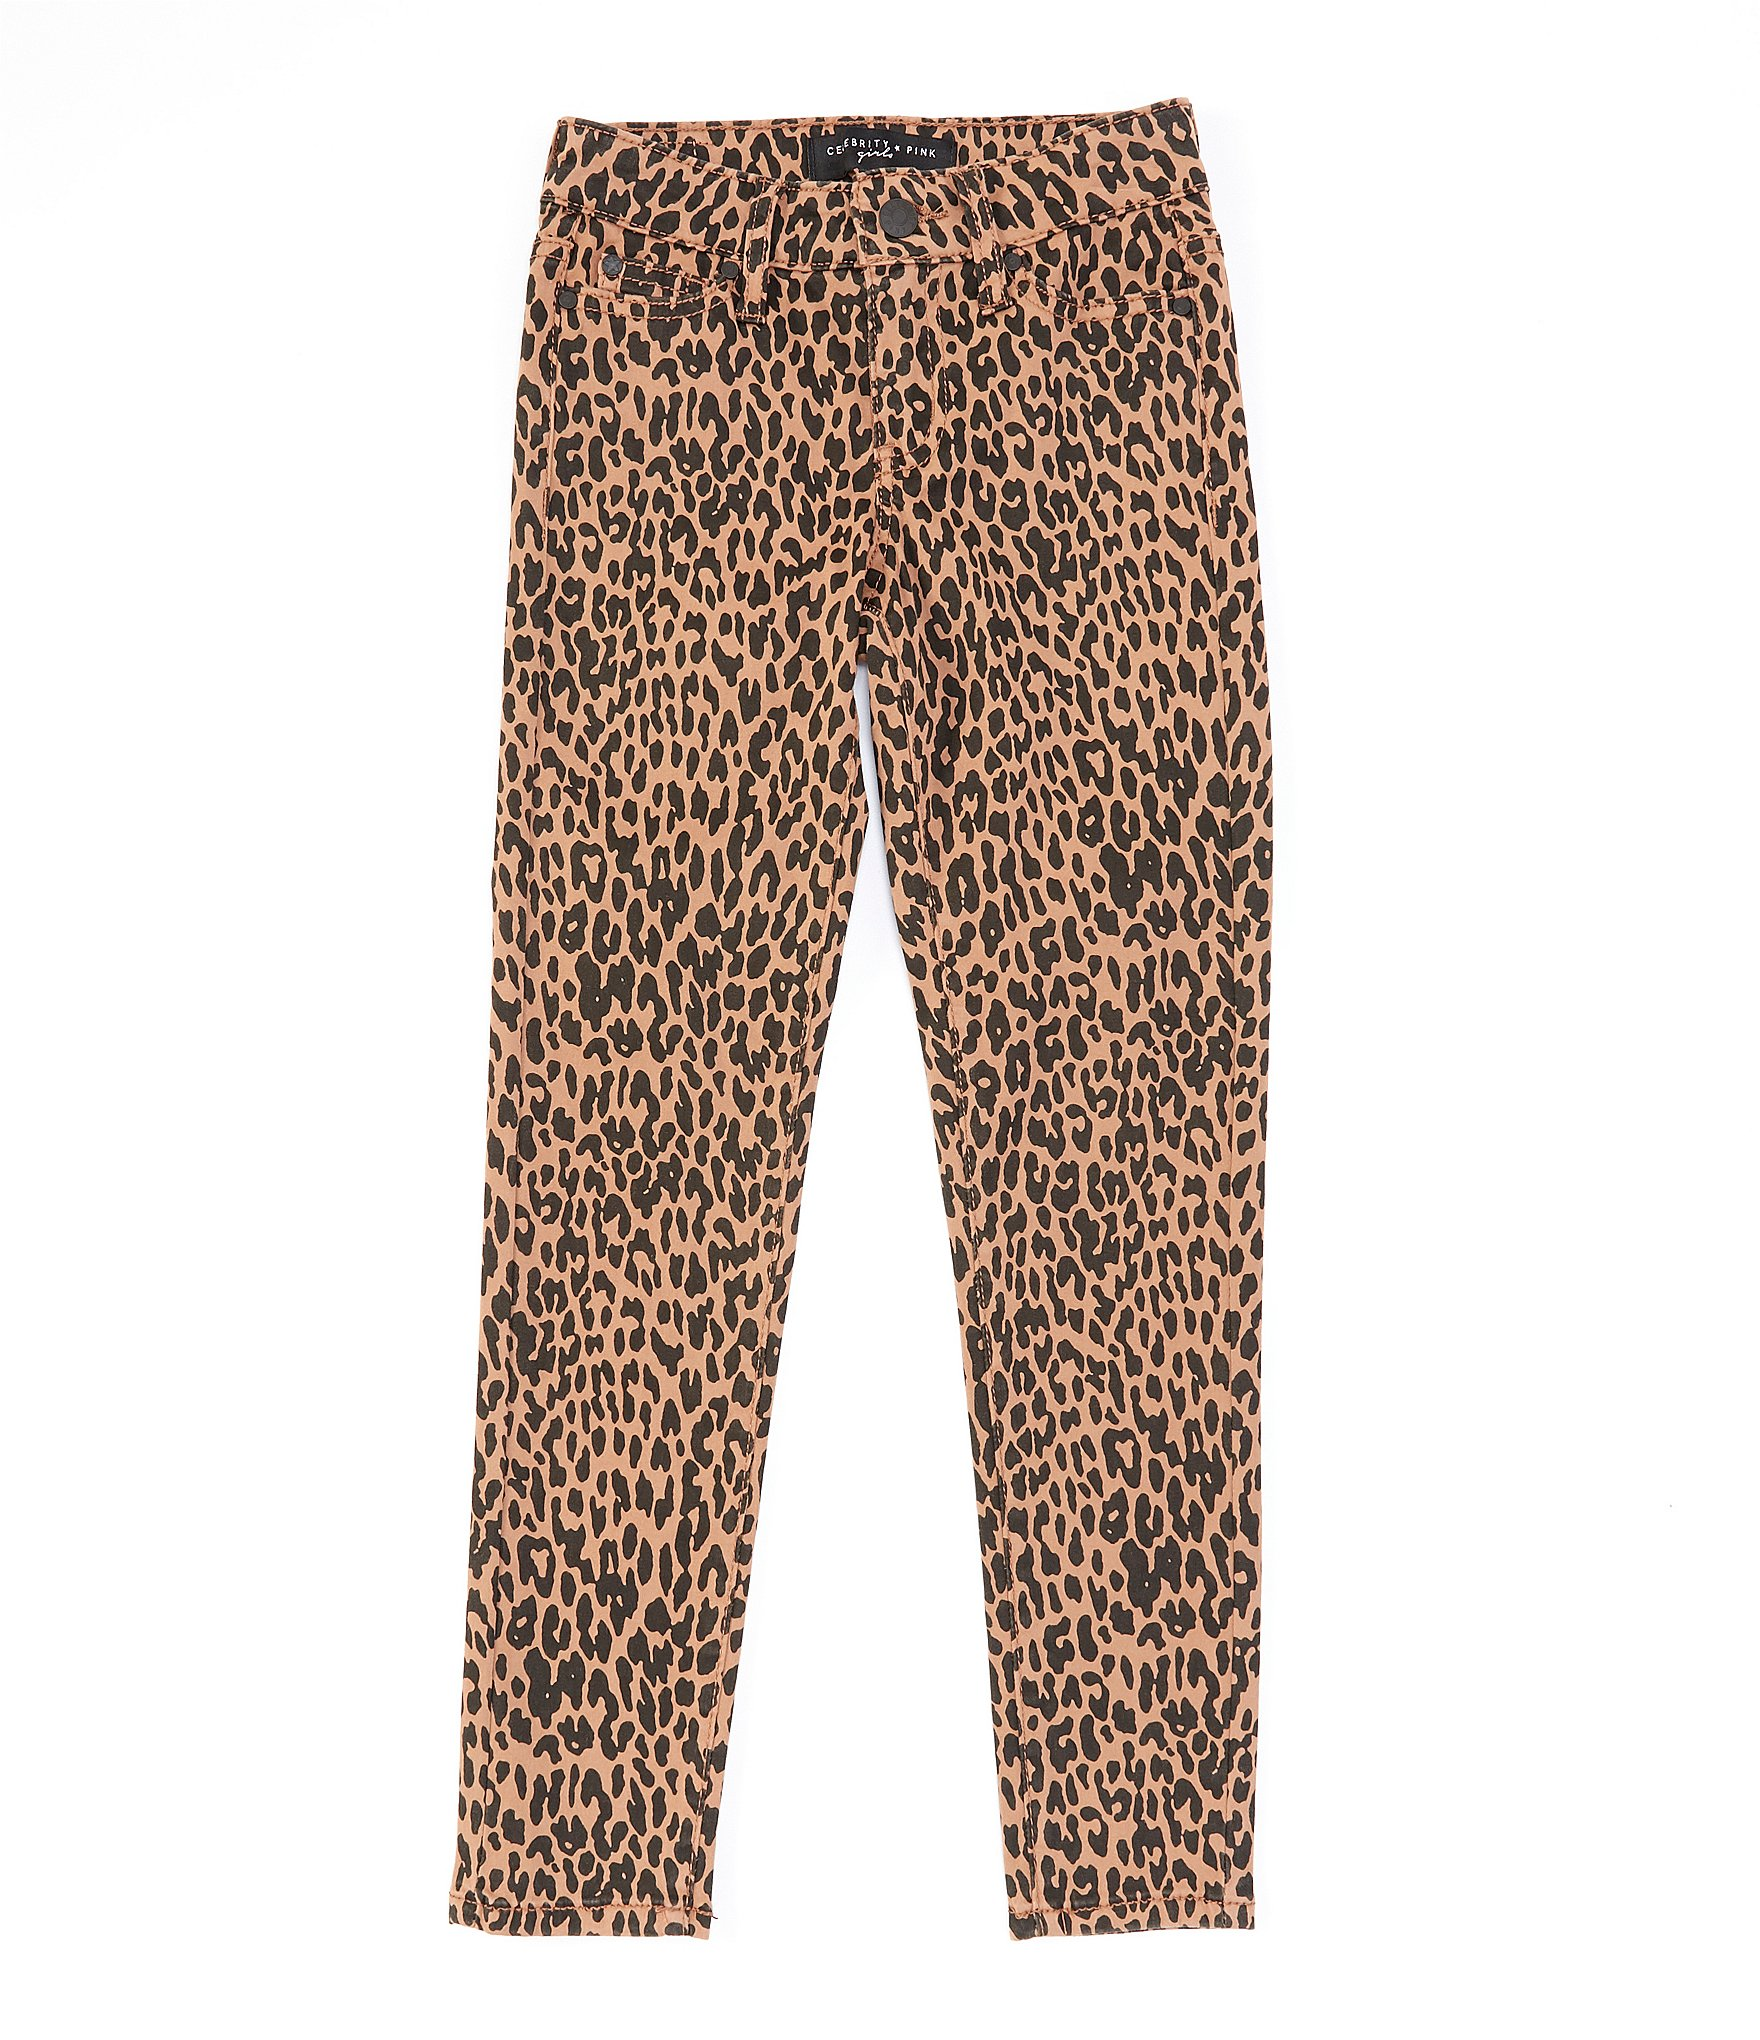 100% genuine super specials yet not vulgar Celebrity Pink Big Girls 7-16 Cheetah-Print Skinny Jean